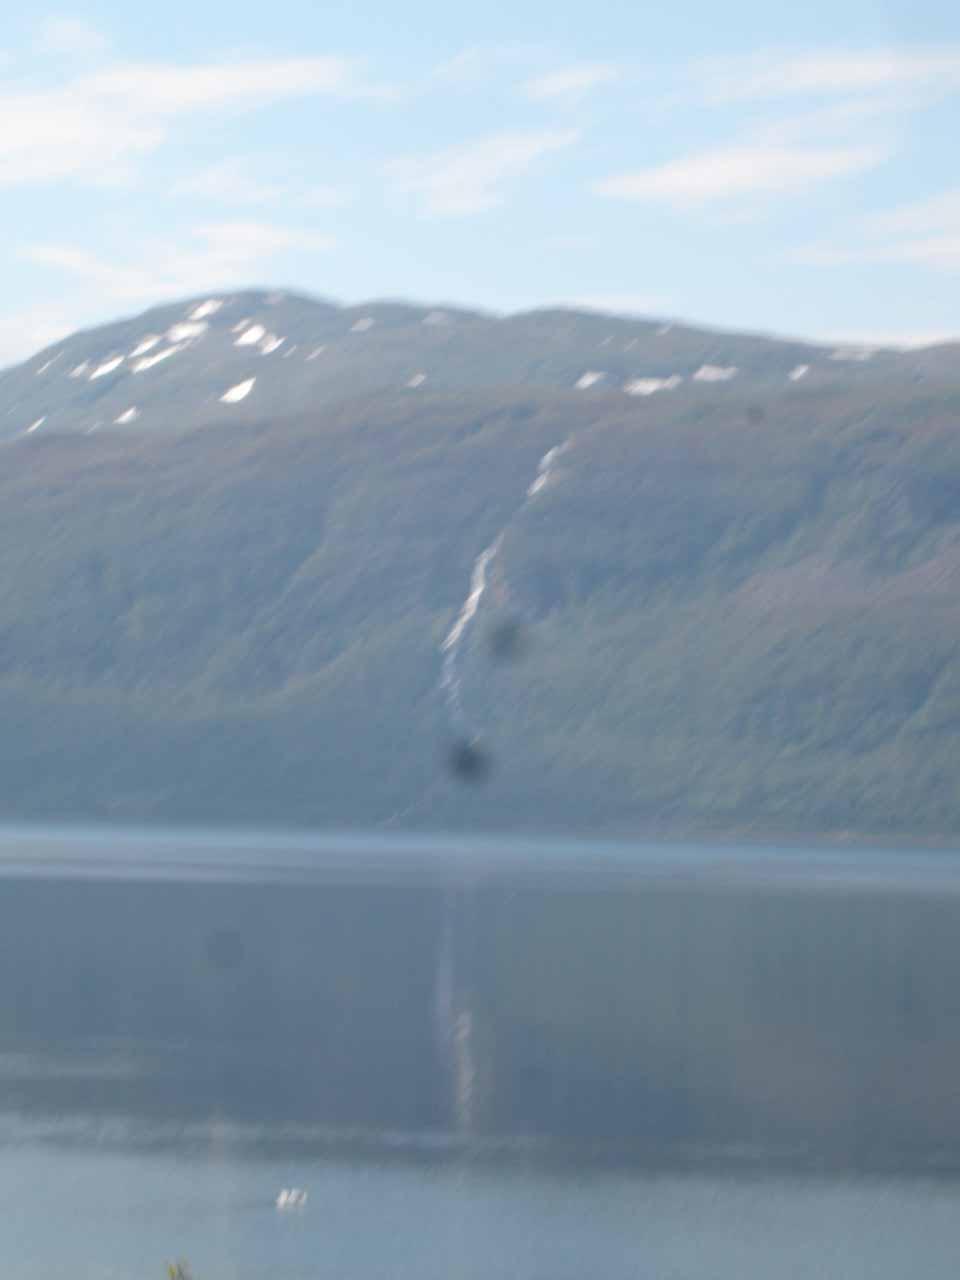 This blurry photo of the first waterfall we noticed across Kåfjorden might be on Bjørkelva (Bjørkelvfossen?)